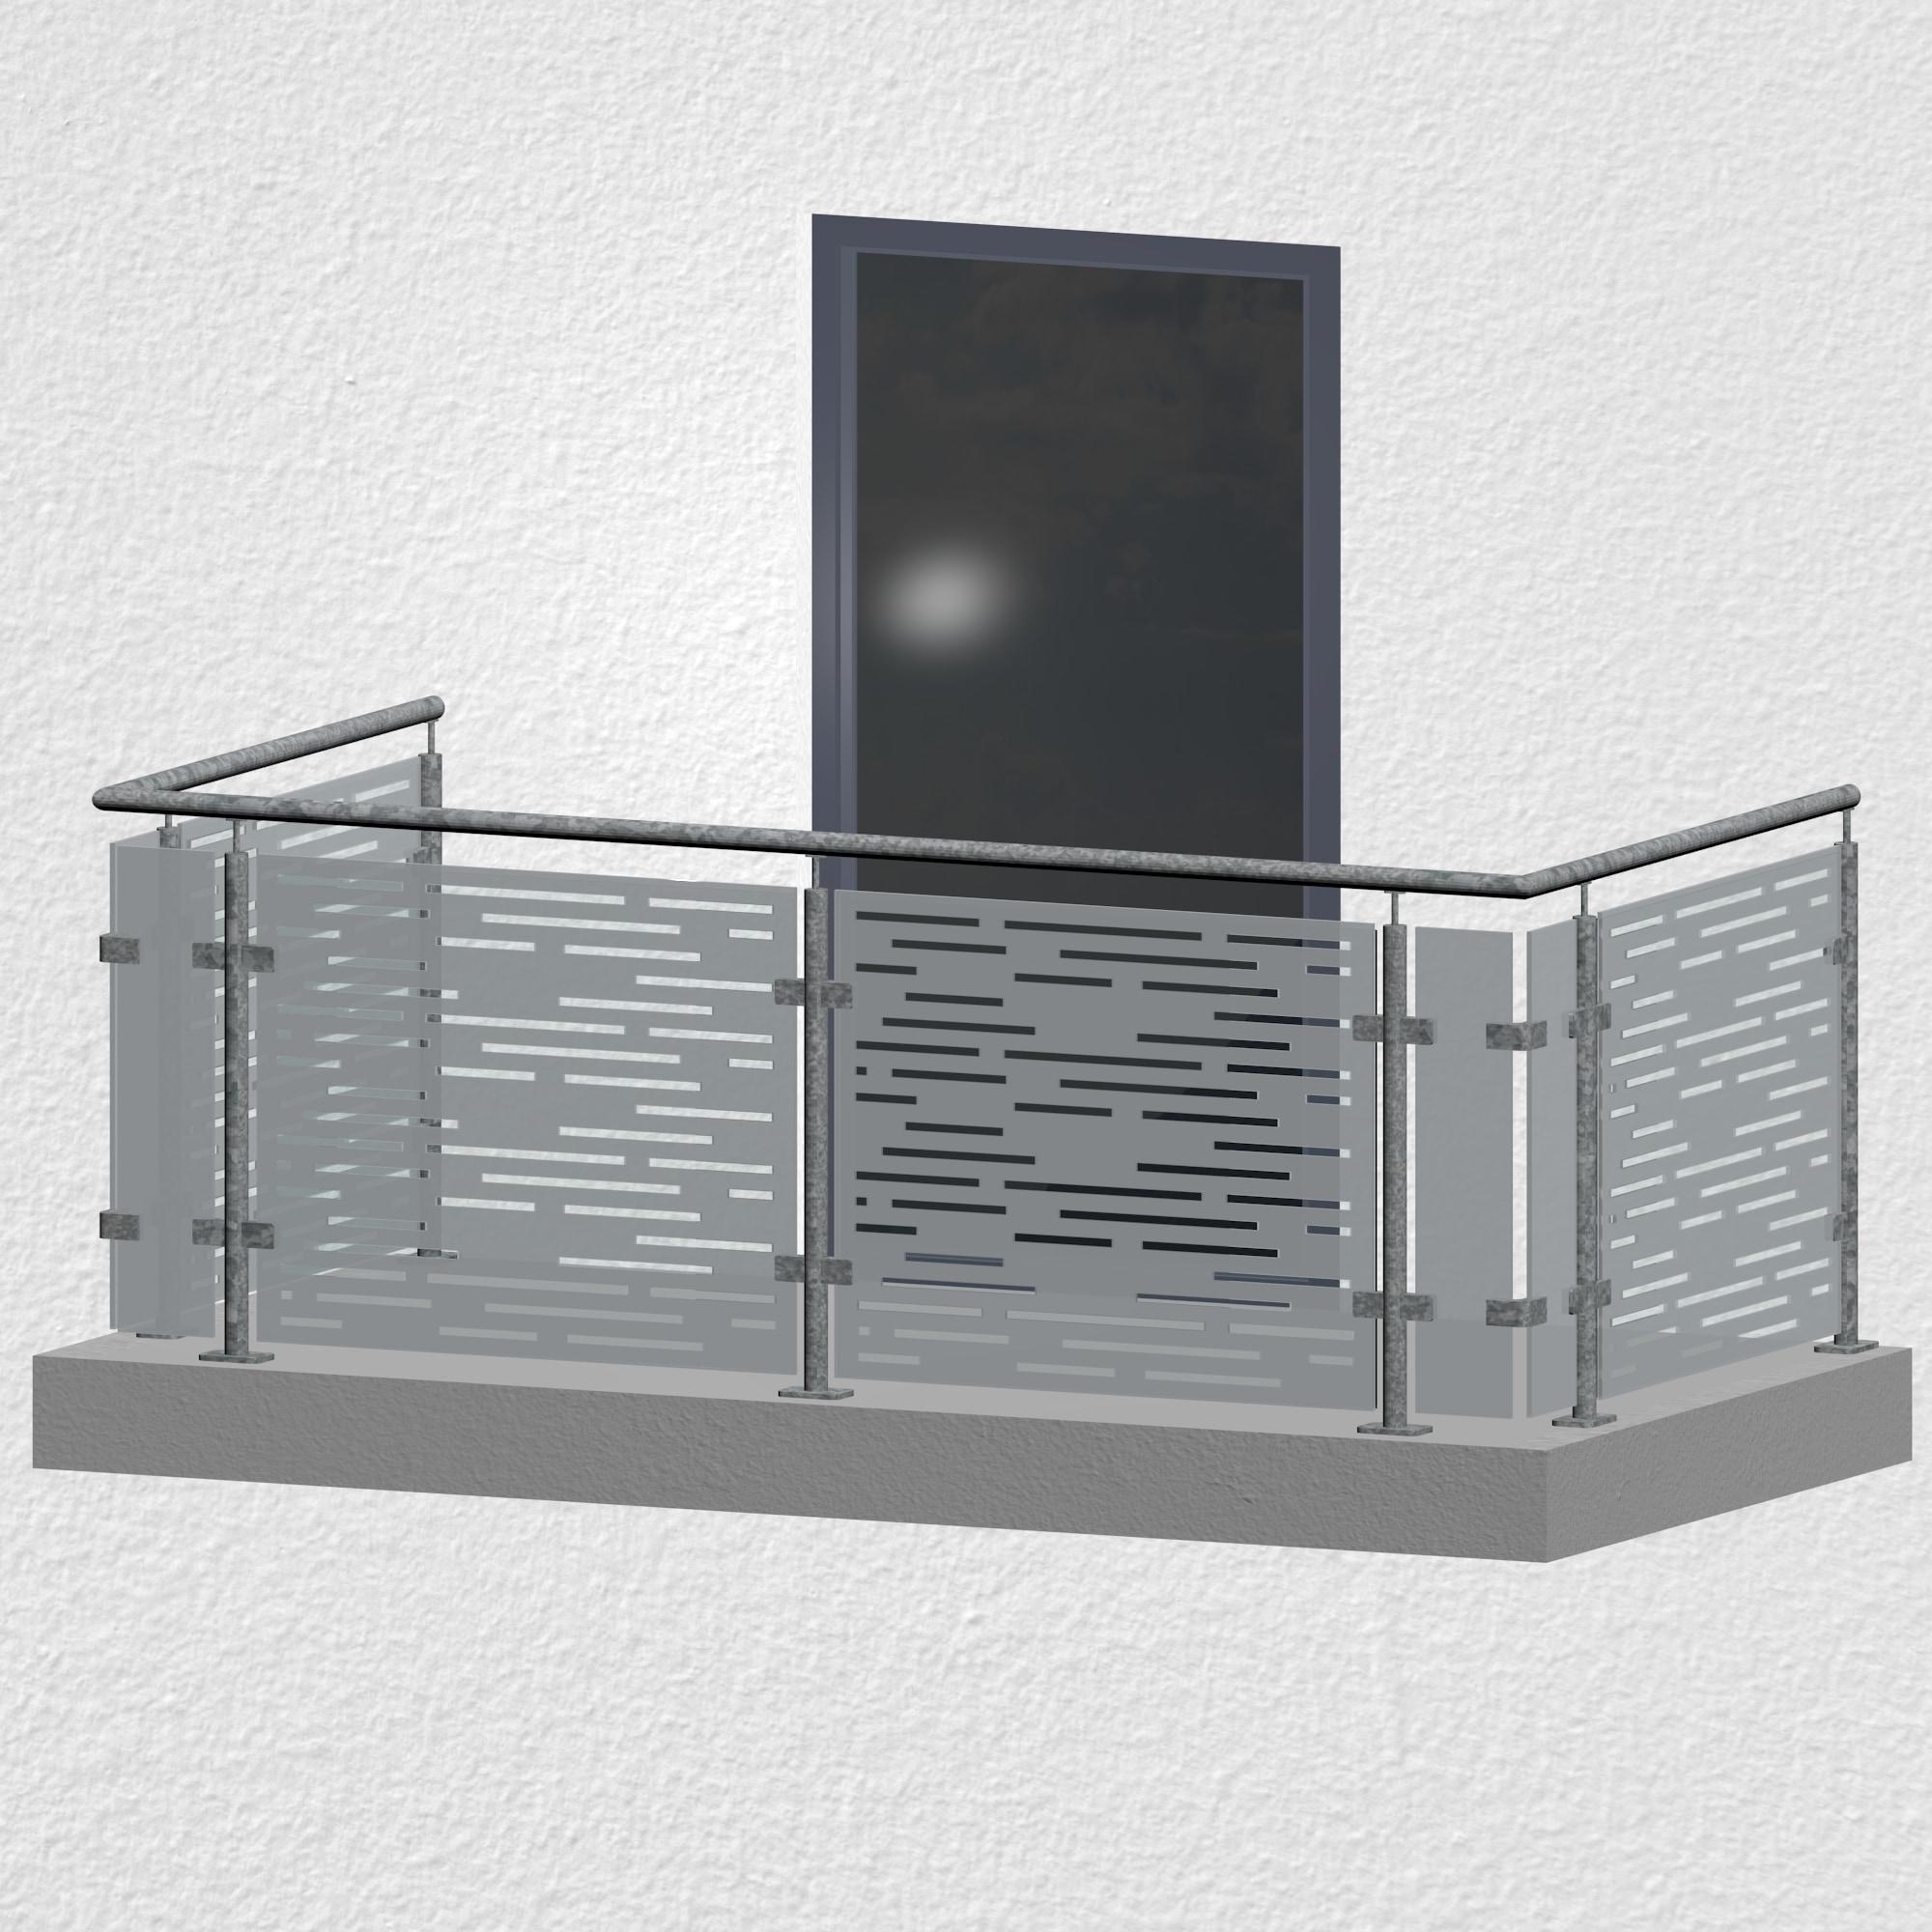 Balkongeländer verzinkt Designglas SF HO MO